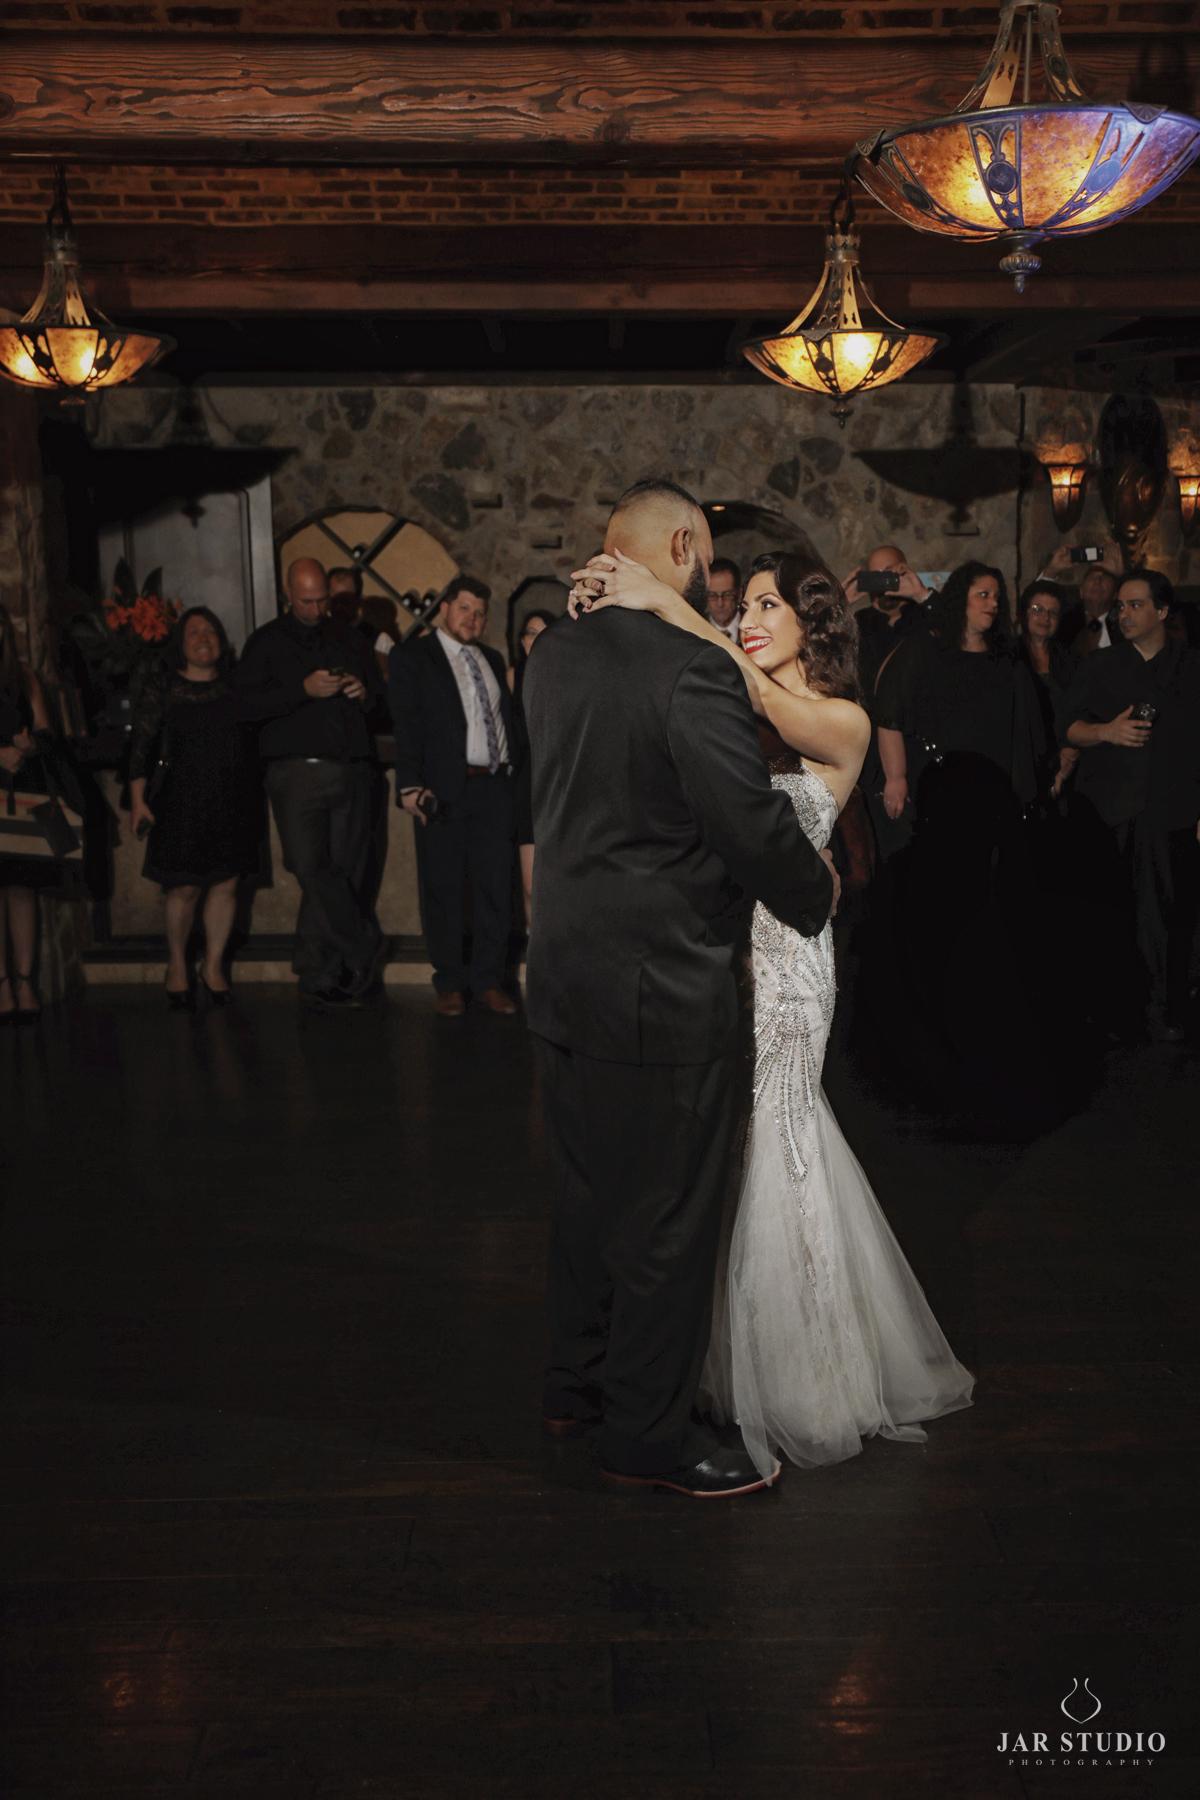 38-first-dance-romantic-bella-collina-photographer-jarstudio.jpg